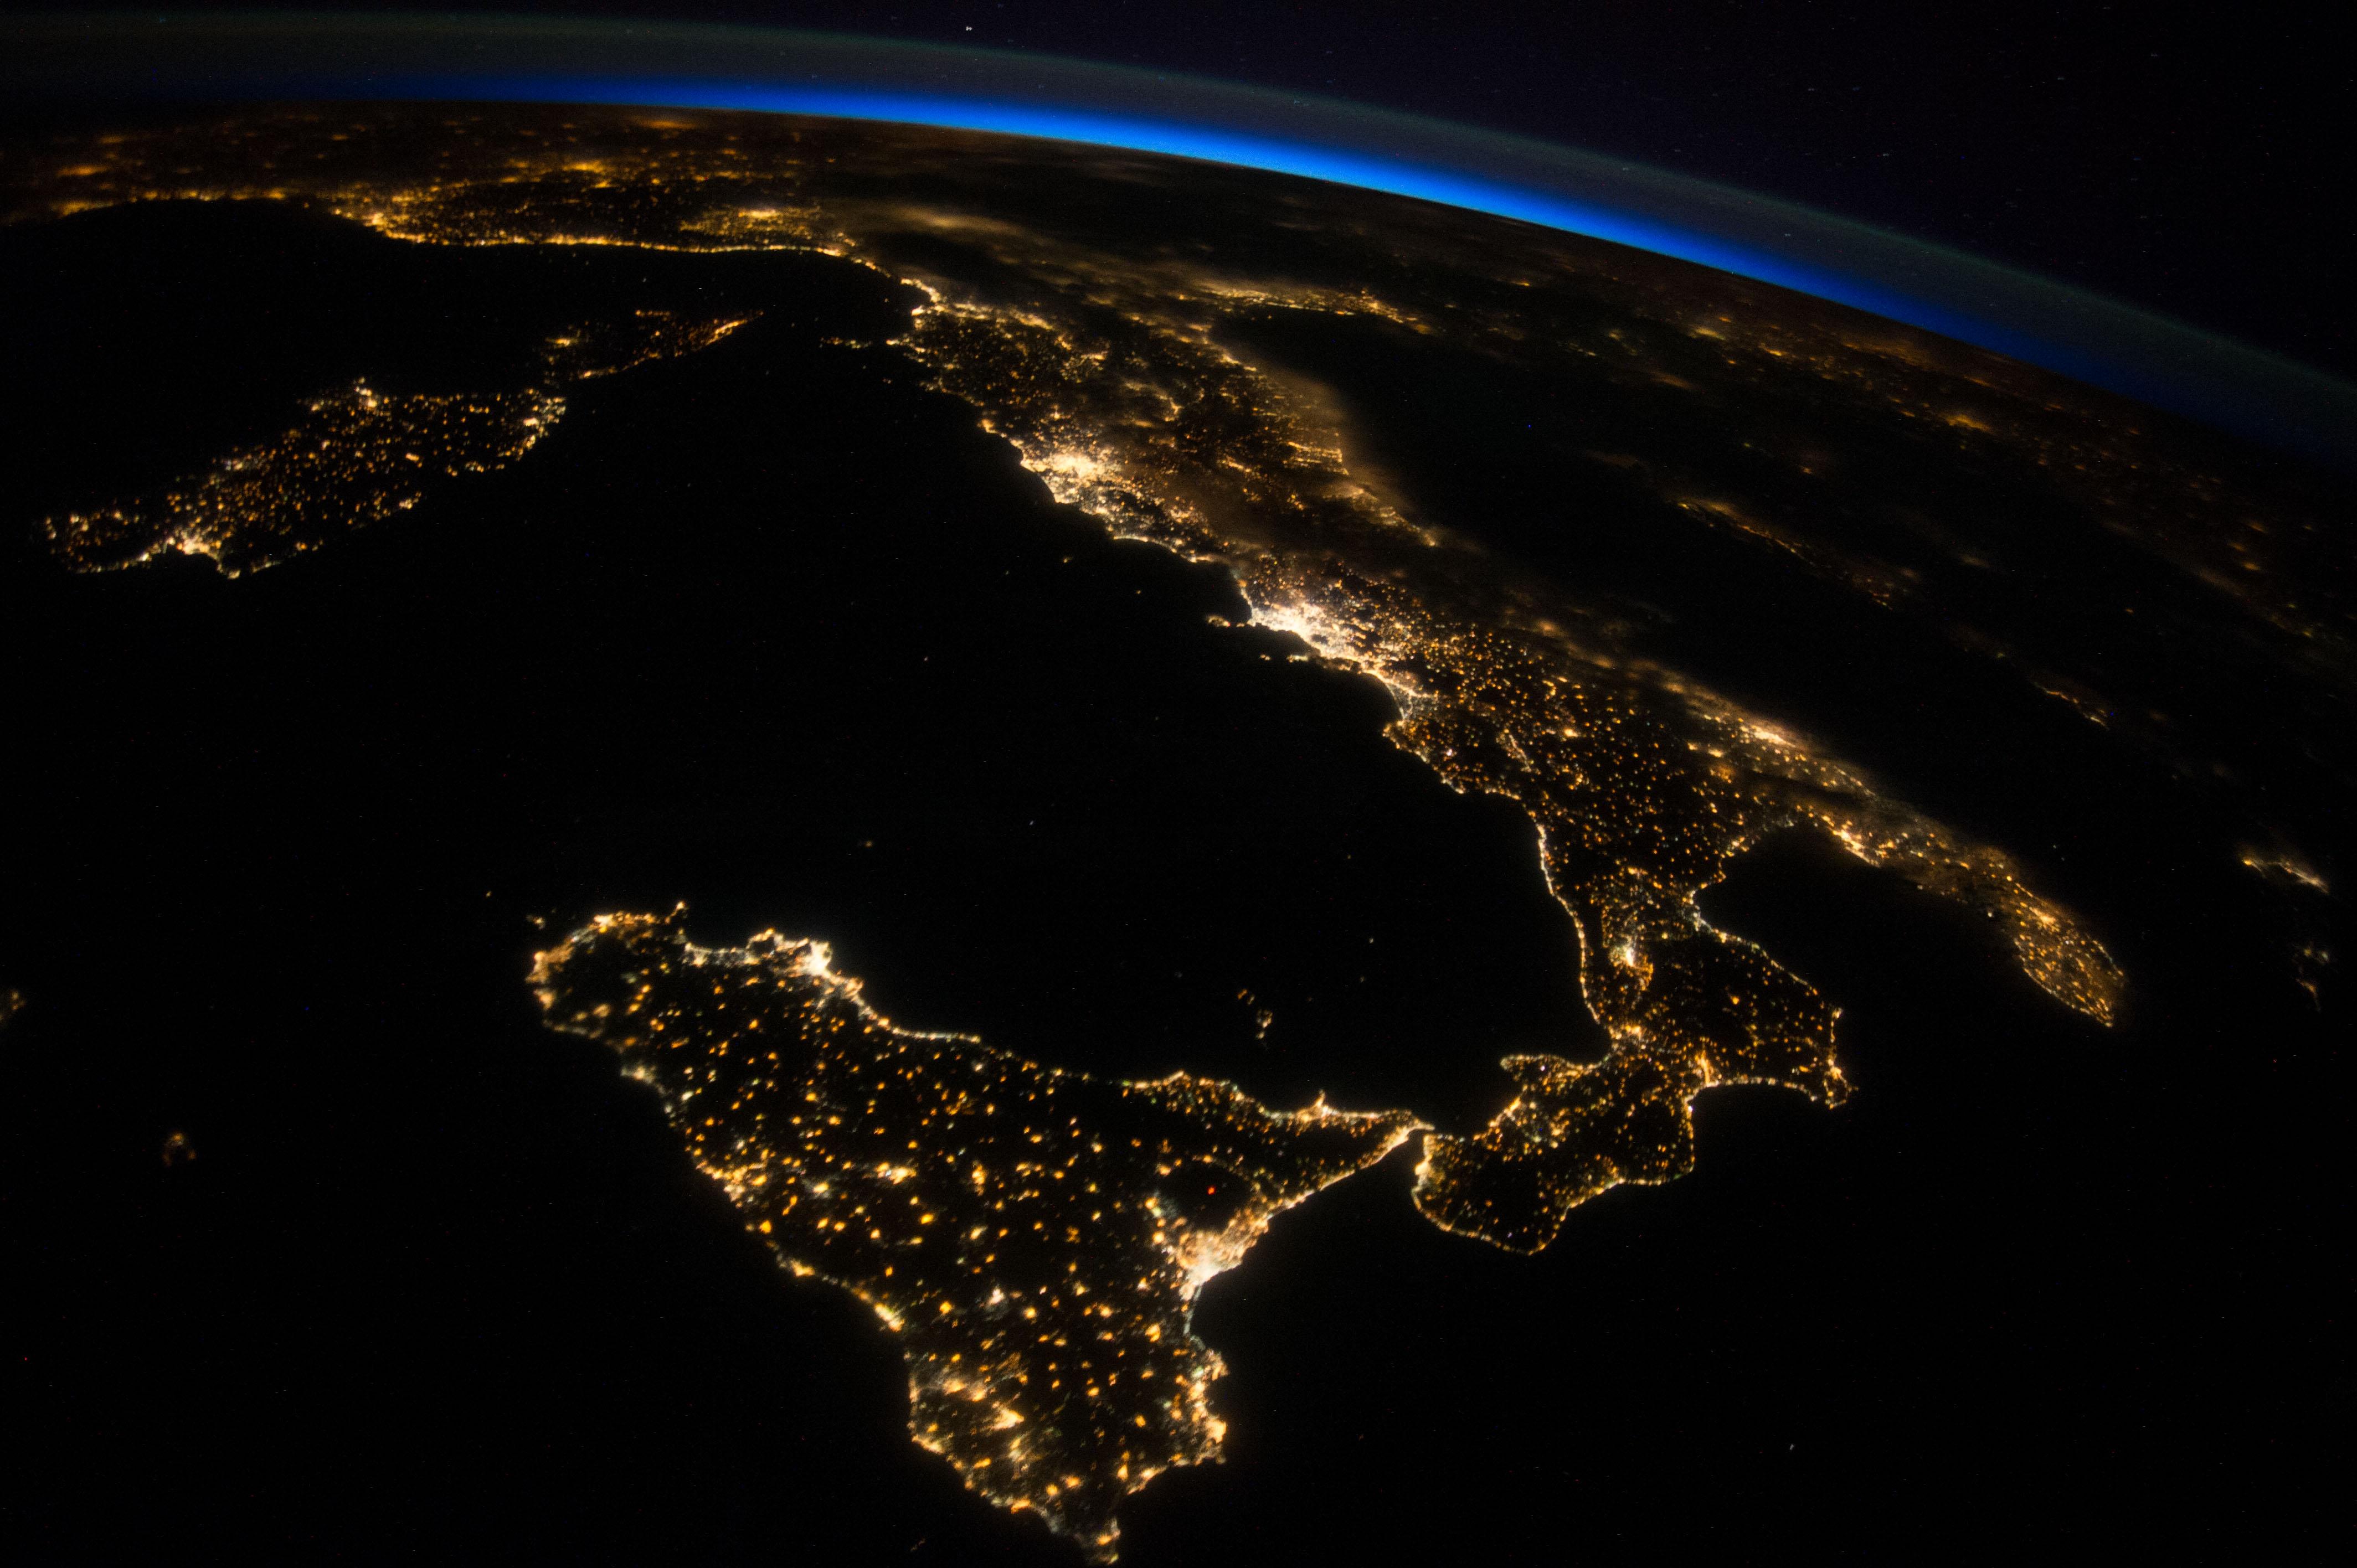 space station nasa - photo #31